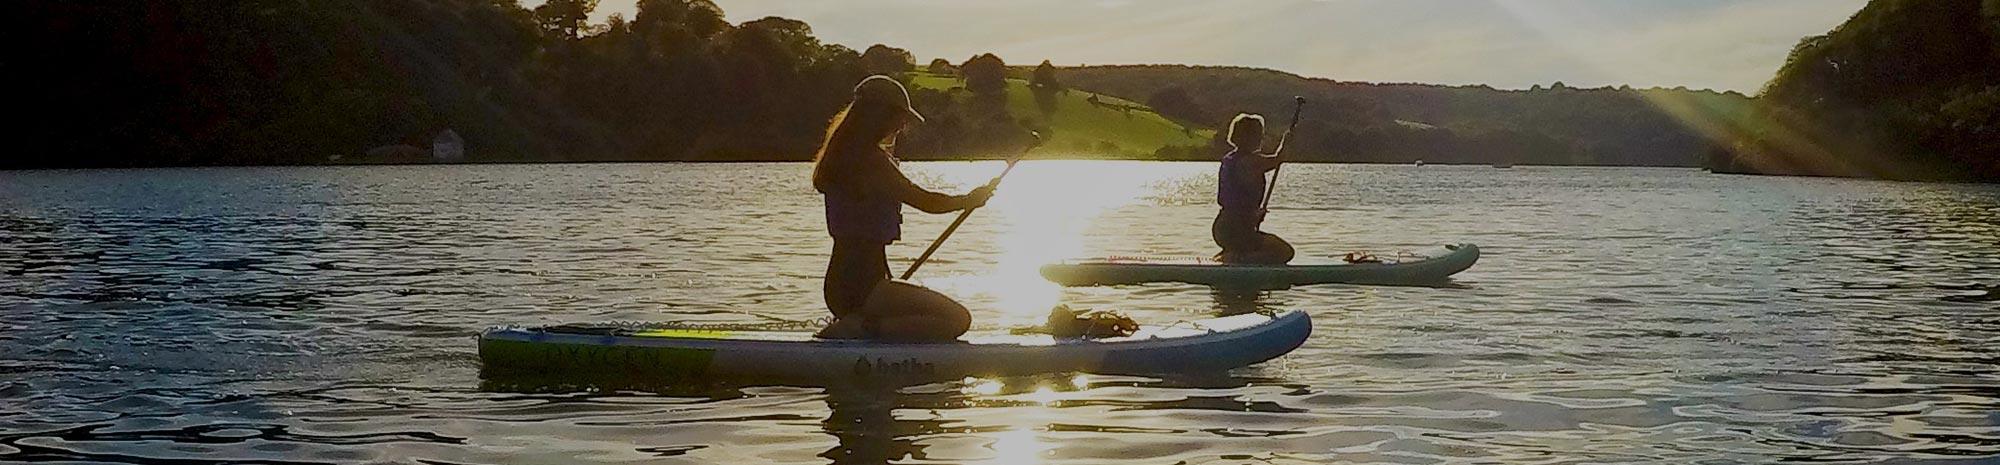 Home - Canoeing, Kayaking, Cornwall Canoe Trips, Kayak Hire